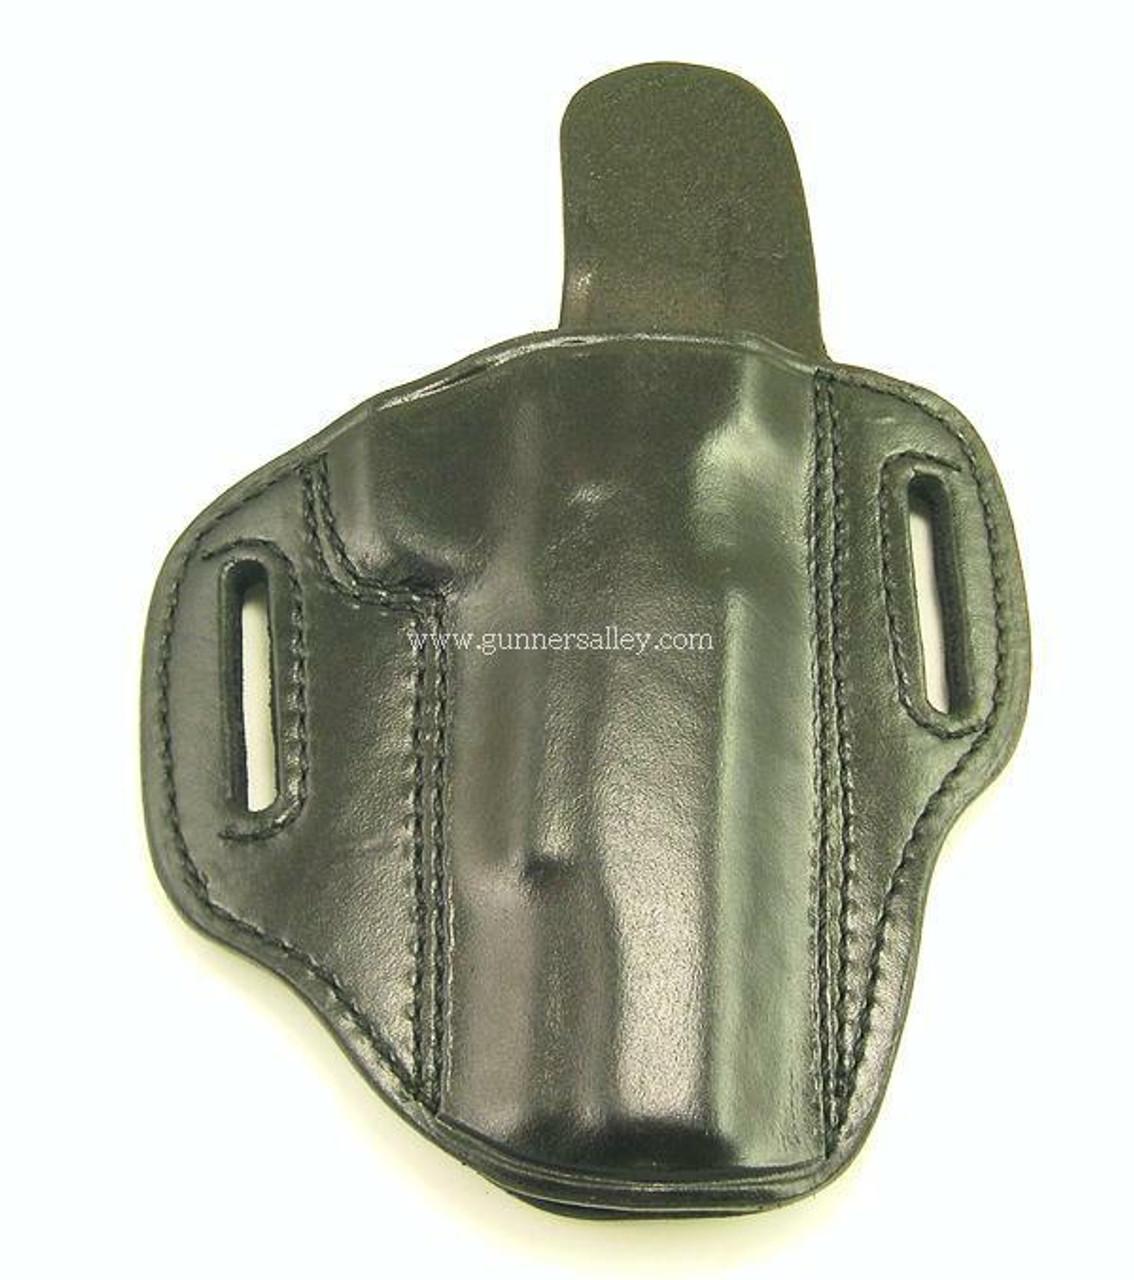 Colt Government Model (5 inch barrel) shown - Right Hand